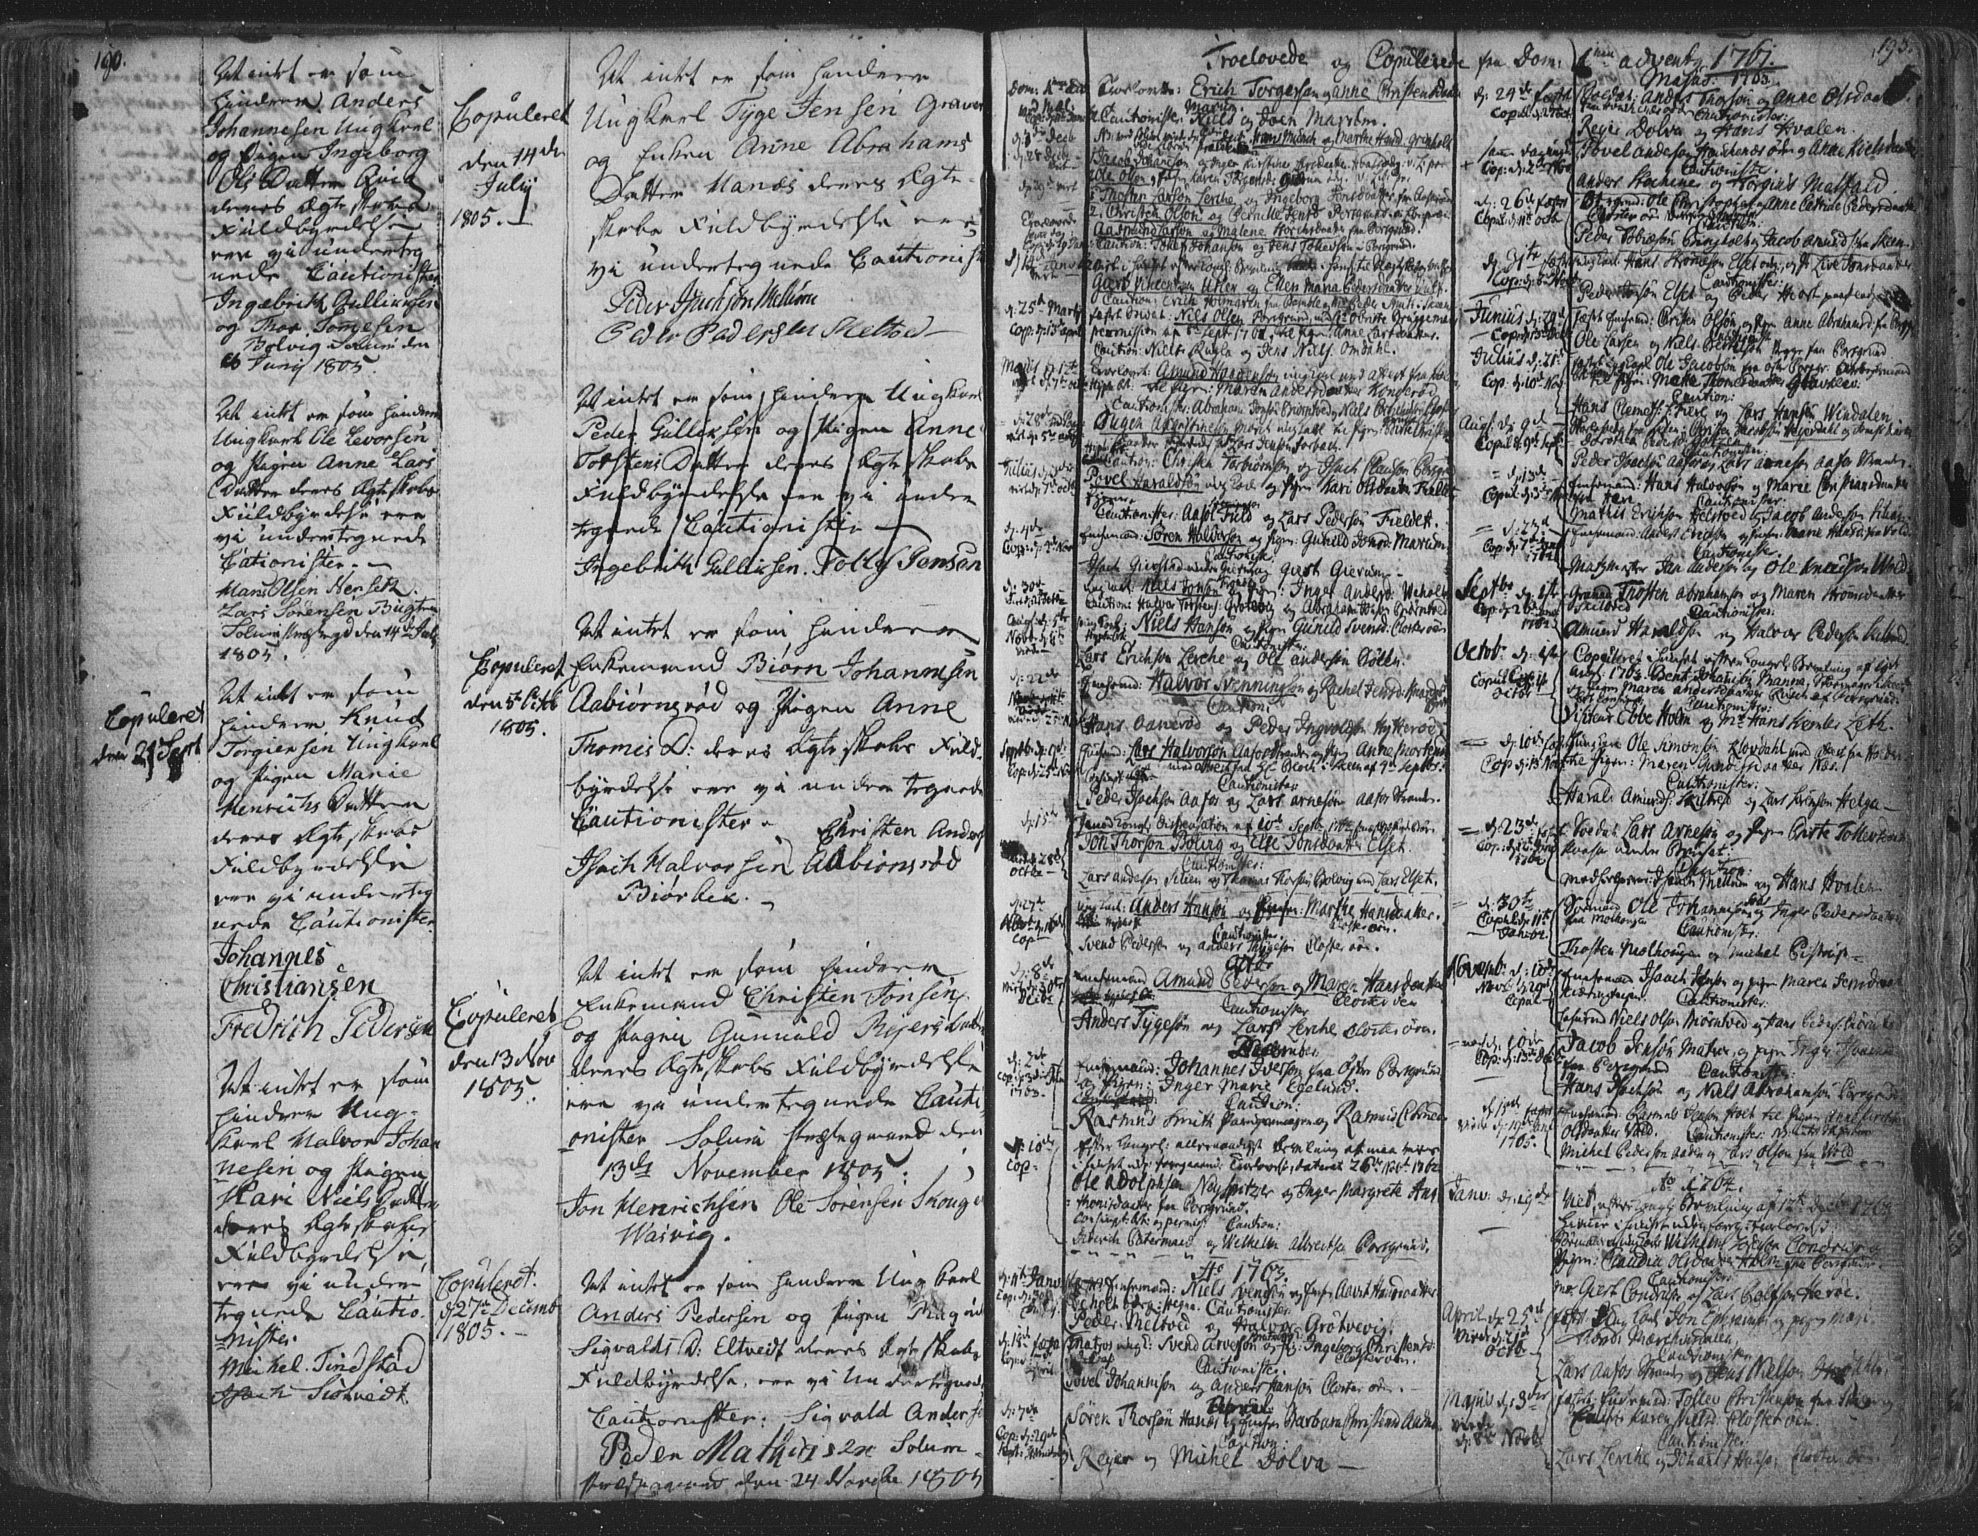 SAKO, Solum kirkebøker, F/Fa/L0003: Ministerialbok nr. I 3, 1761-1814, s. 192-193